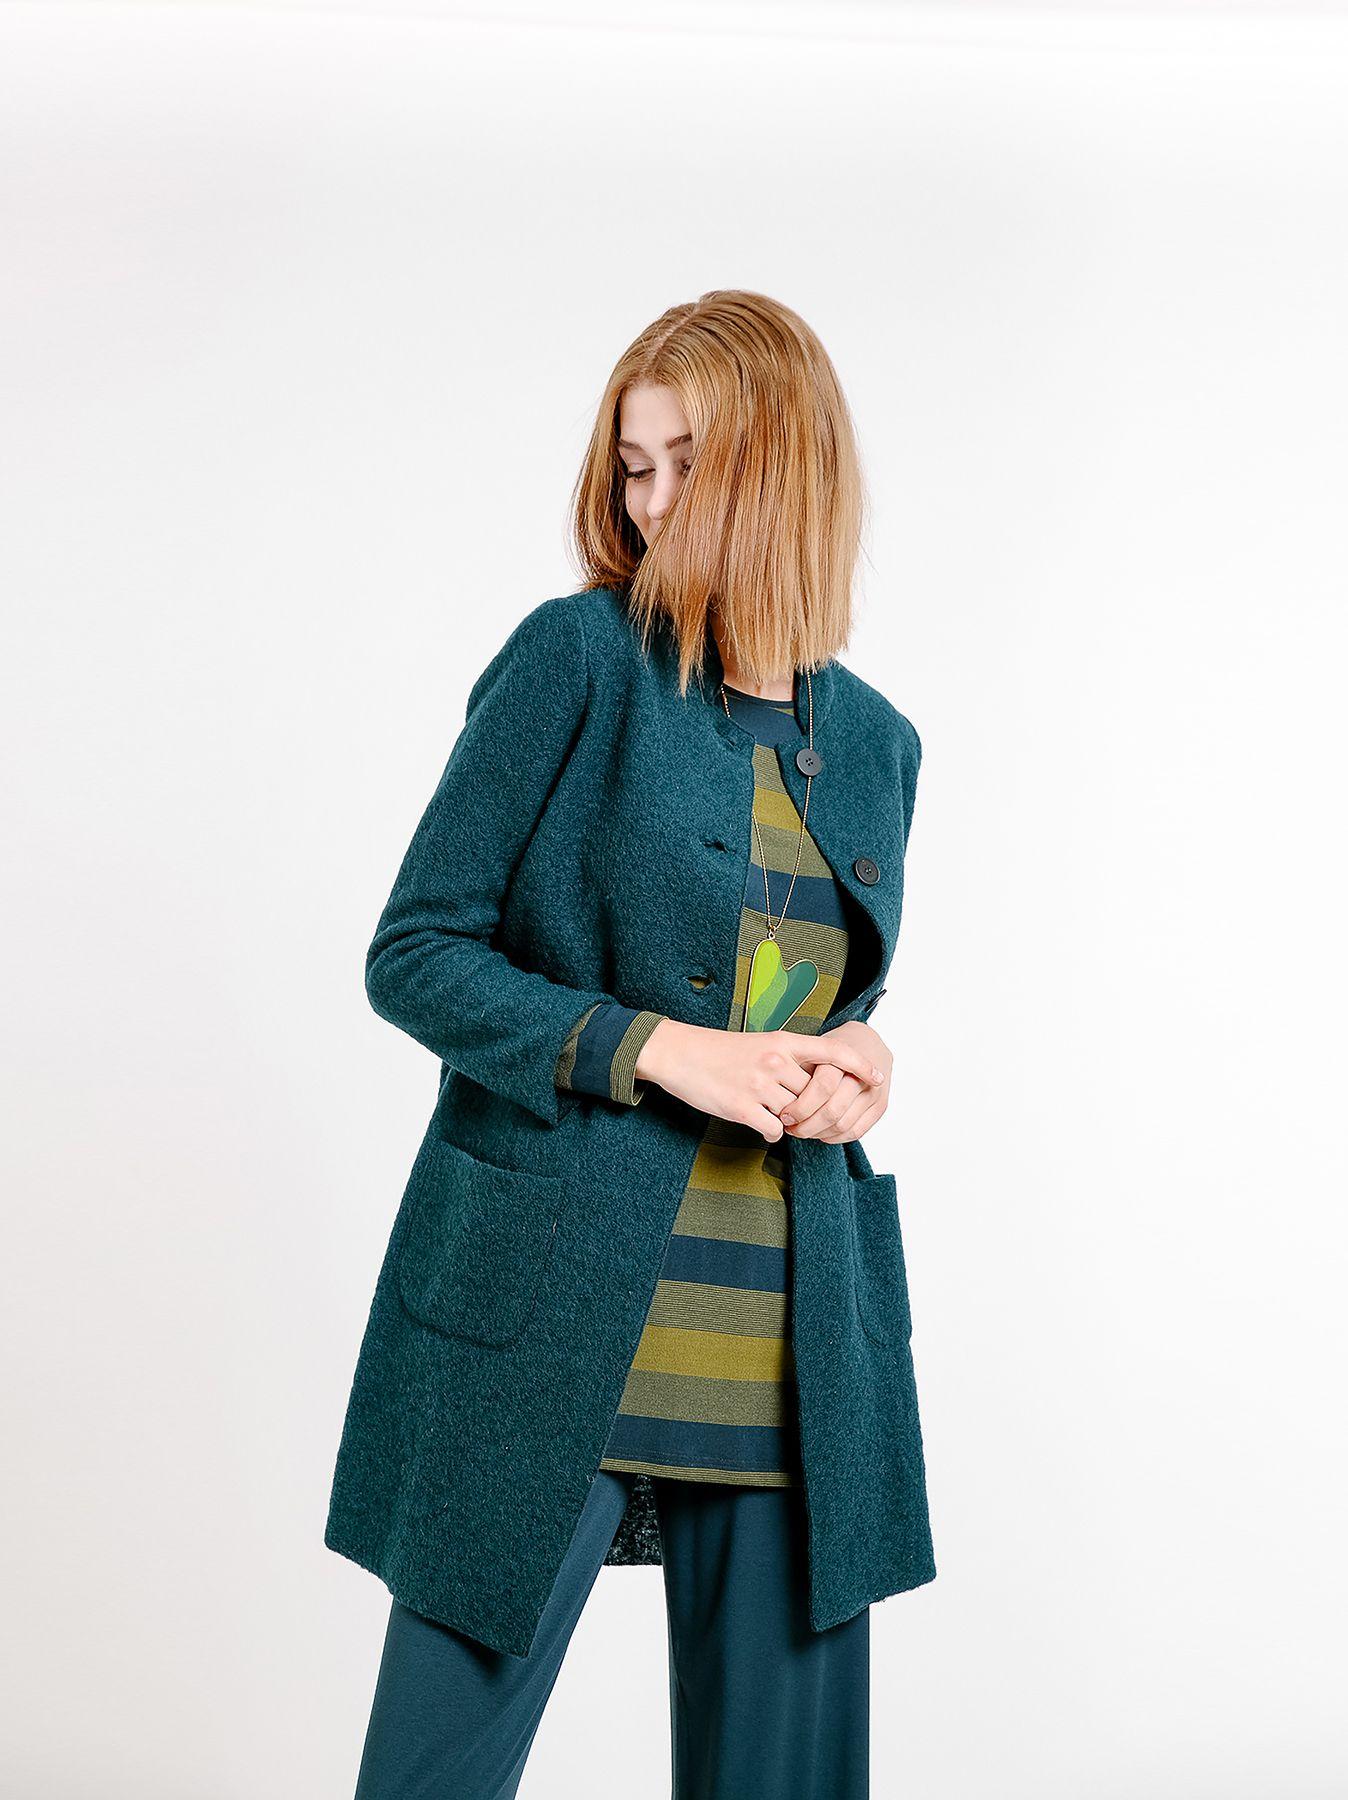 Giacca lunga in lana cotta